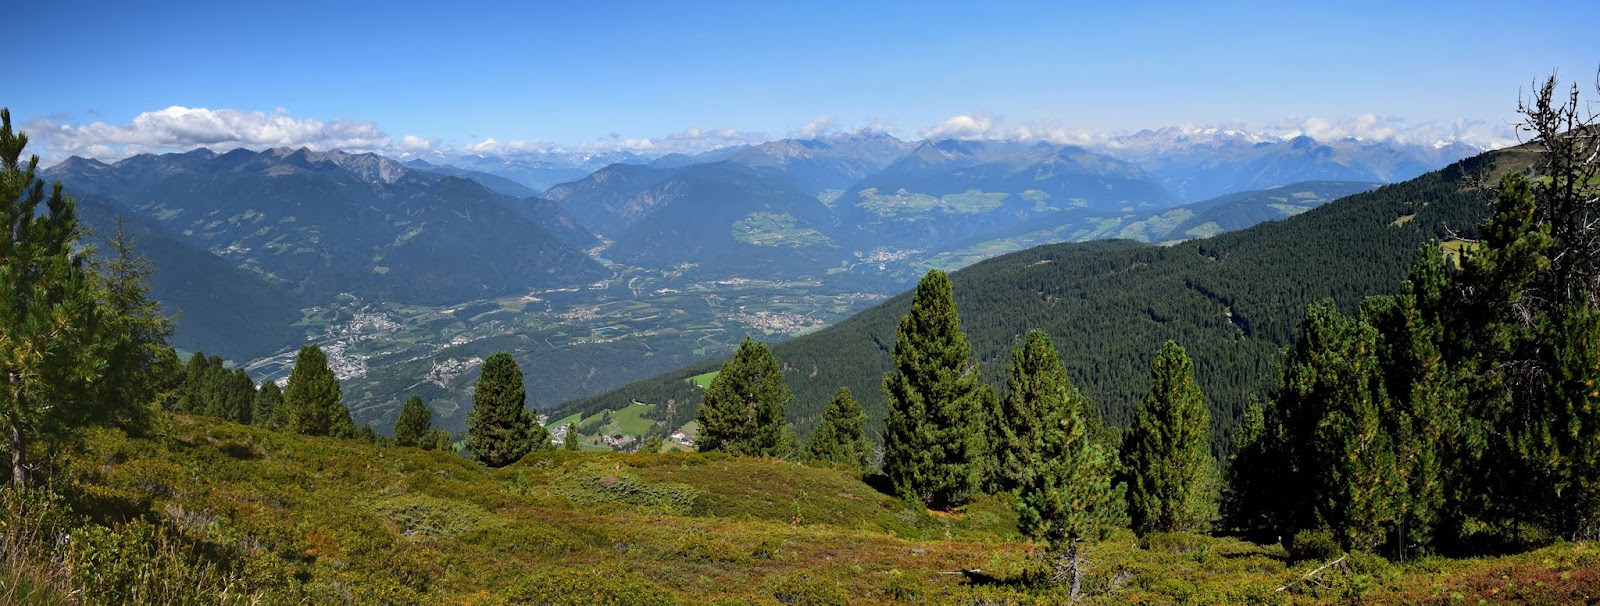 22.8. Z Brixen Plose, Rossalm -13.jpg